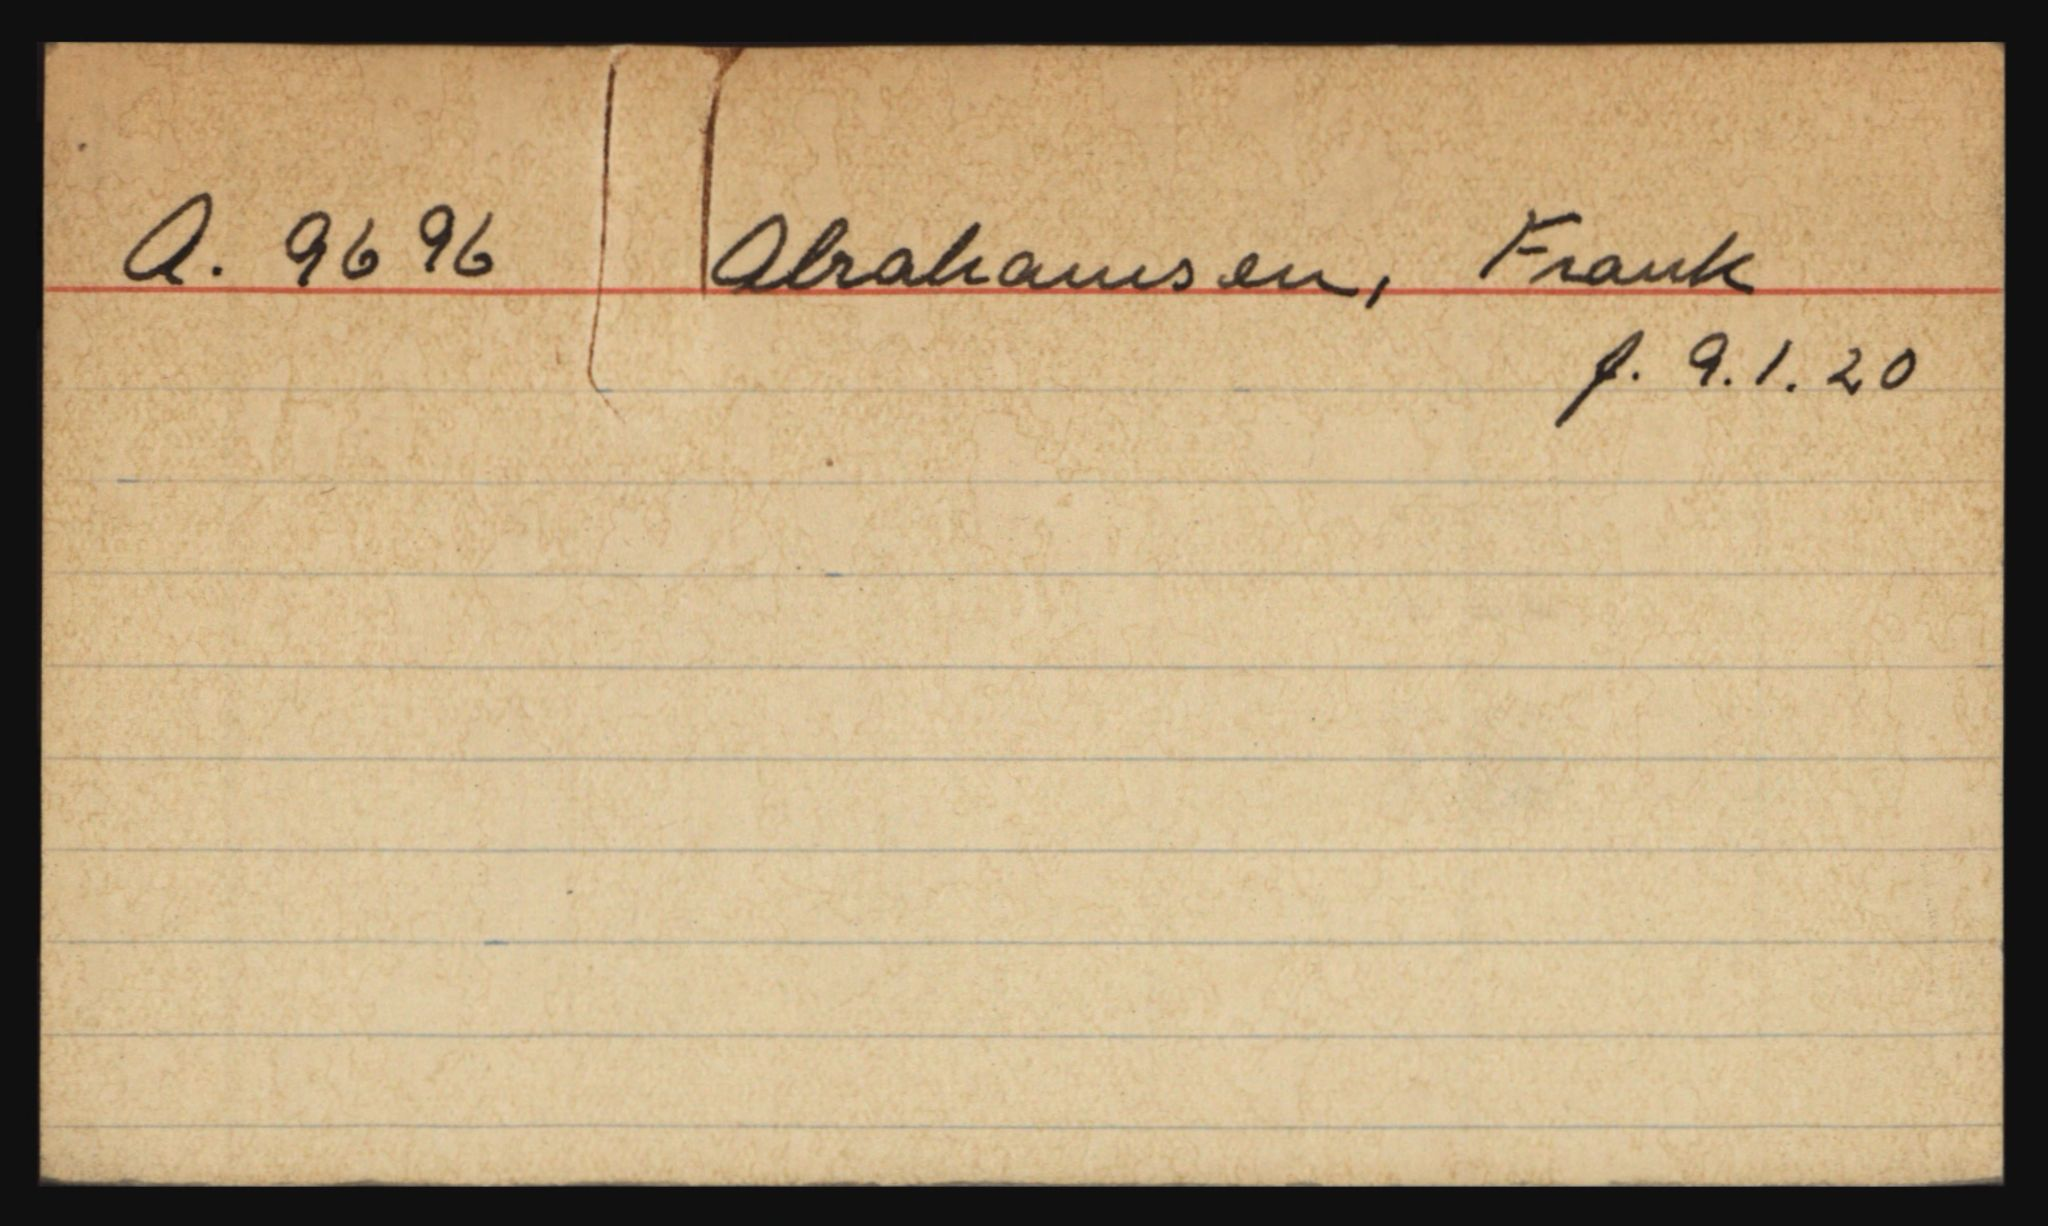 RA, Befehlshaber der Sicherheitspolizei und des SD, E/Eb/L0001: Kartotekkort over fanger i Akershus fengsel: A-K, 1940-1945